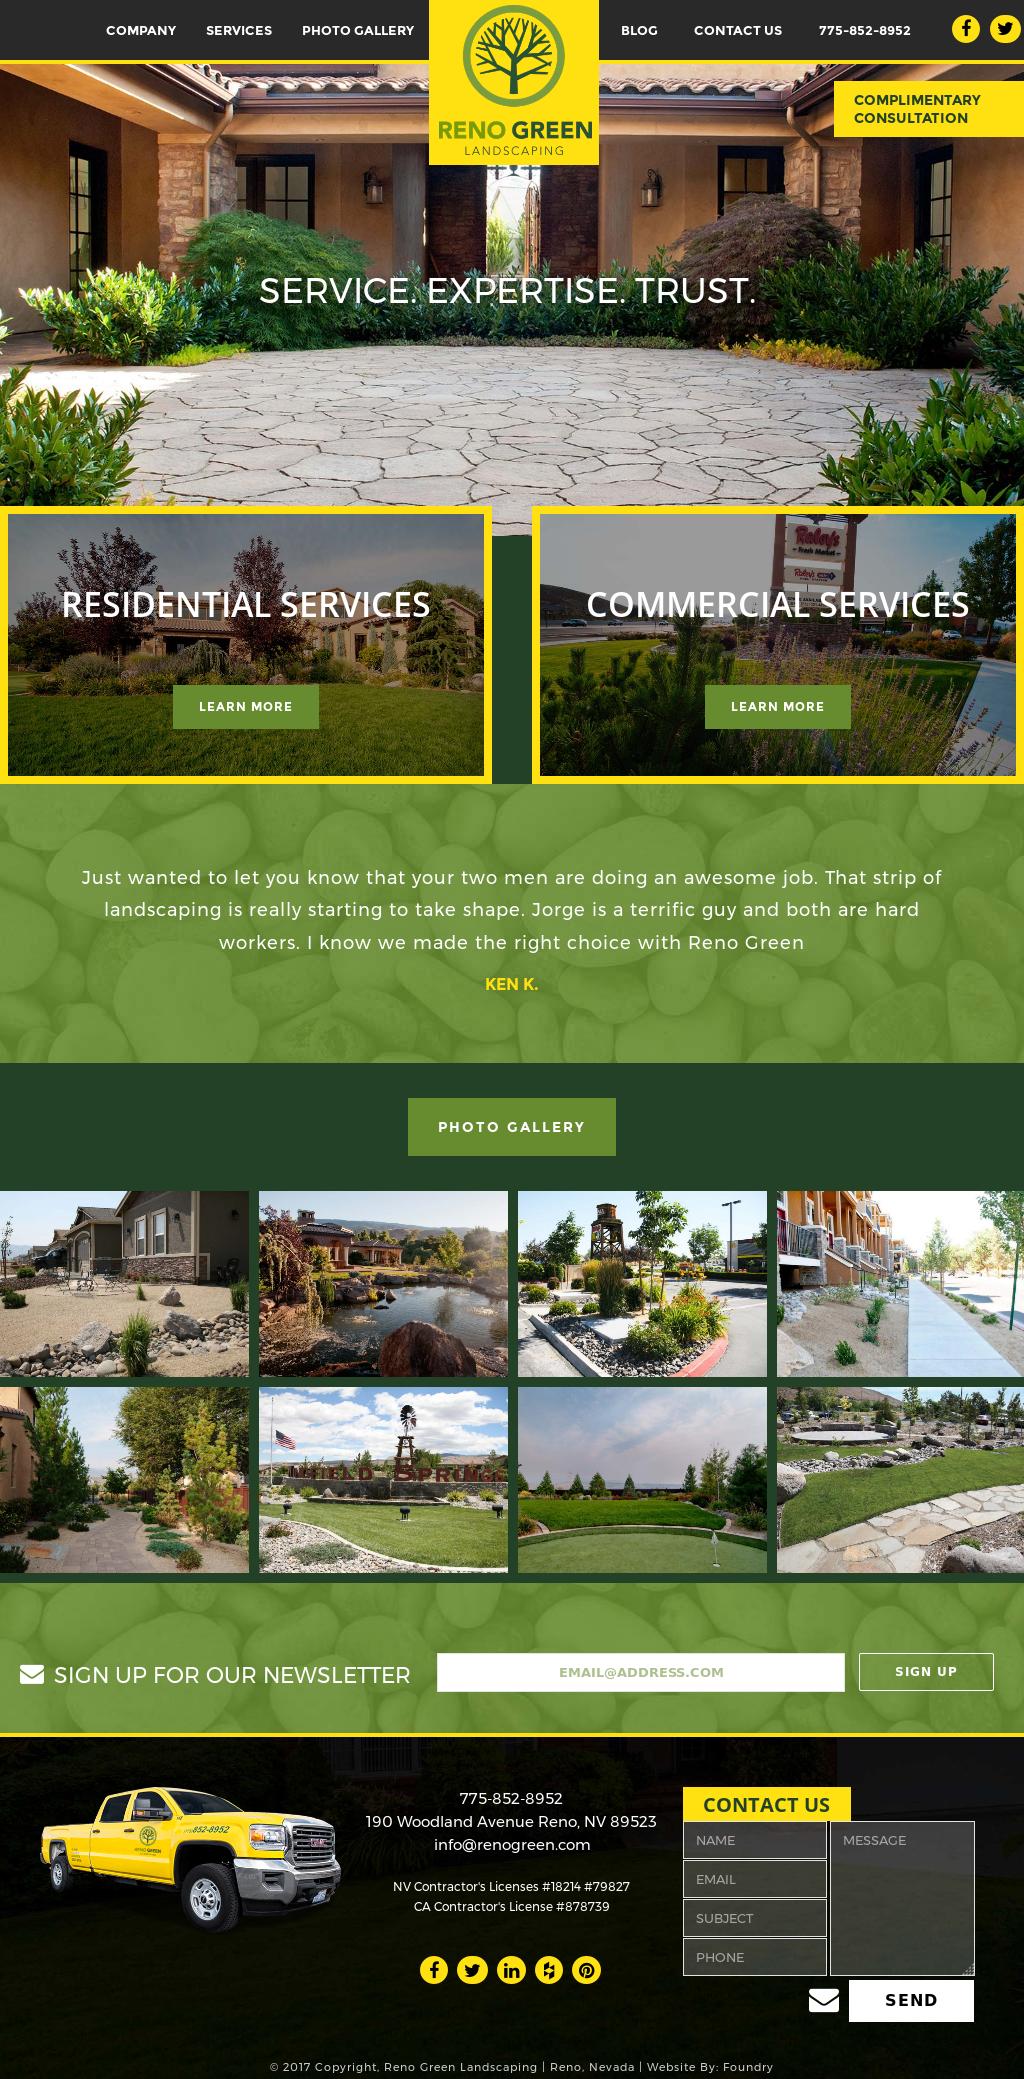 Reno Green Landscaping's website screenshot on May 2017 - Reno Green Landscaping Competitors, Revenue And Employees - Owler